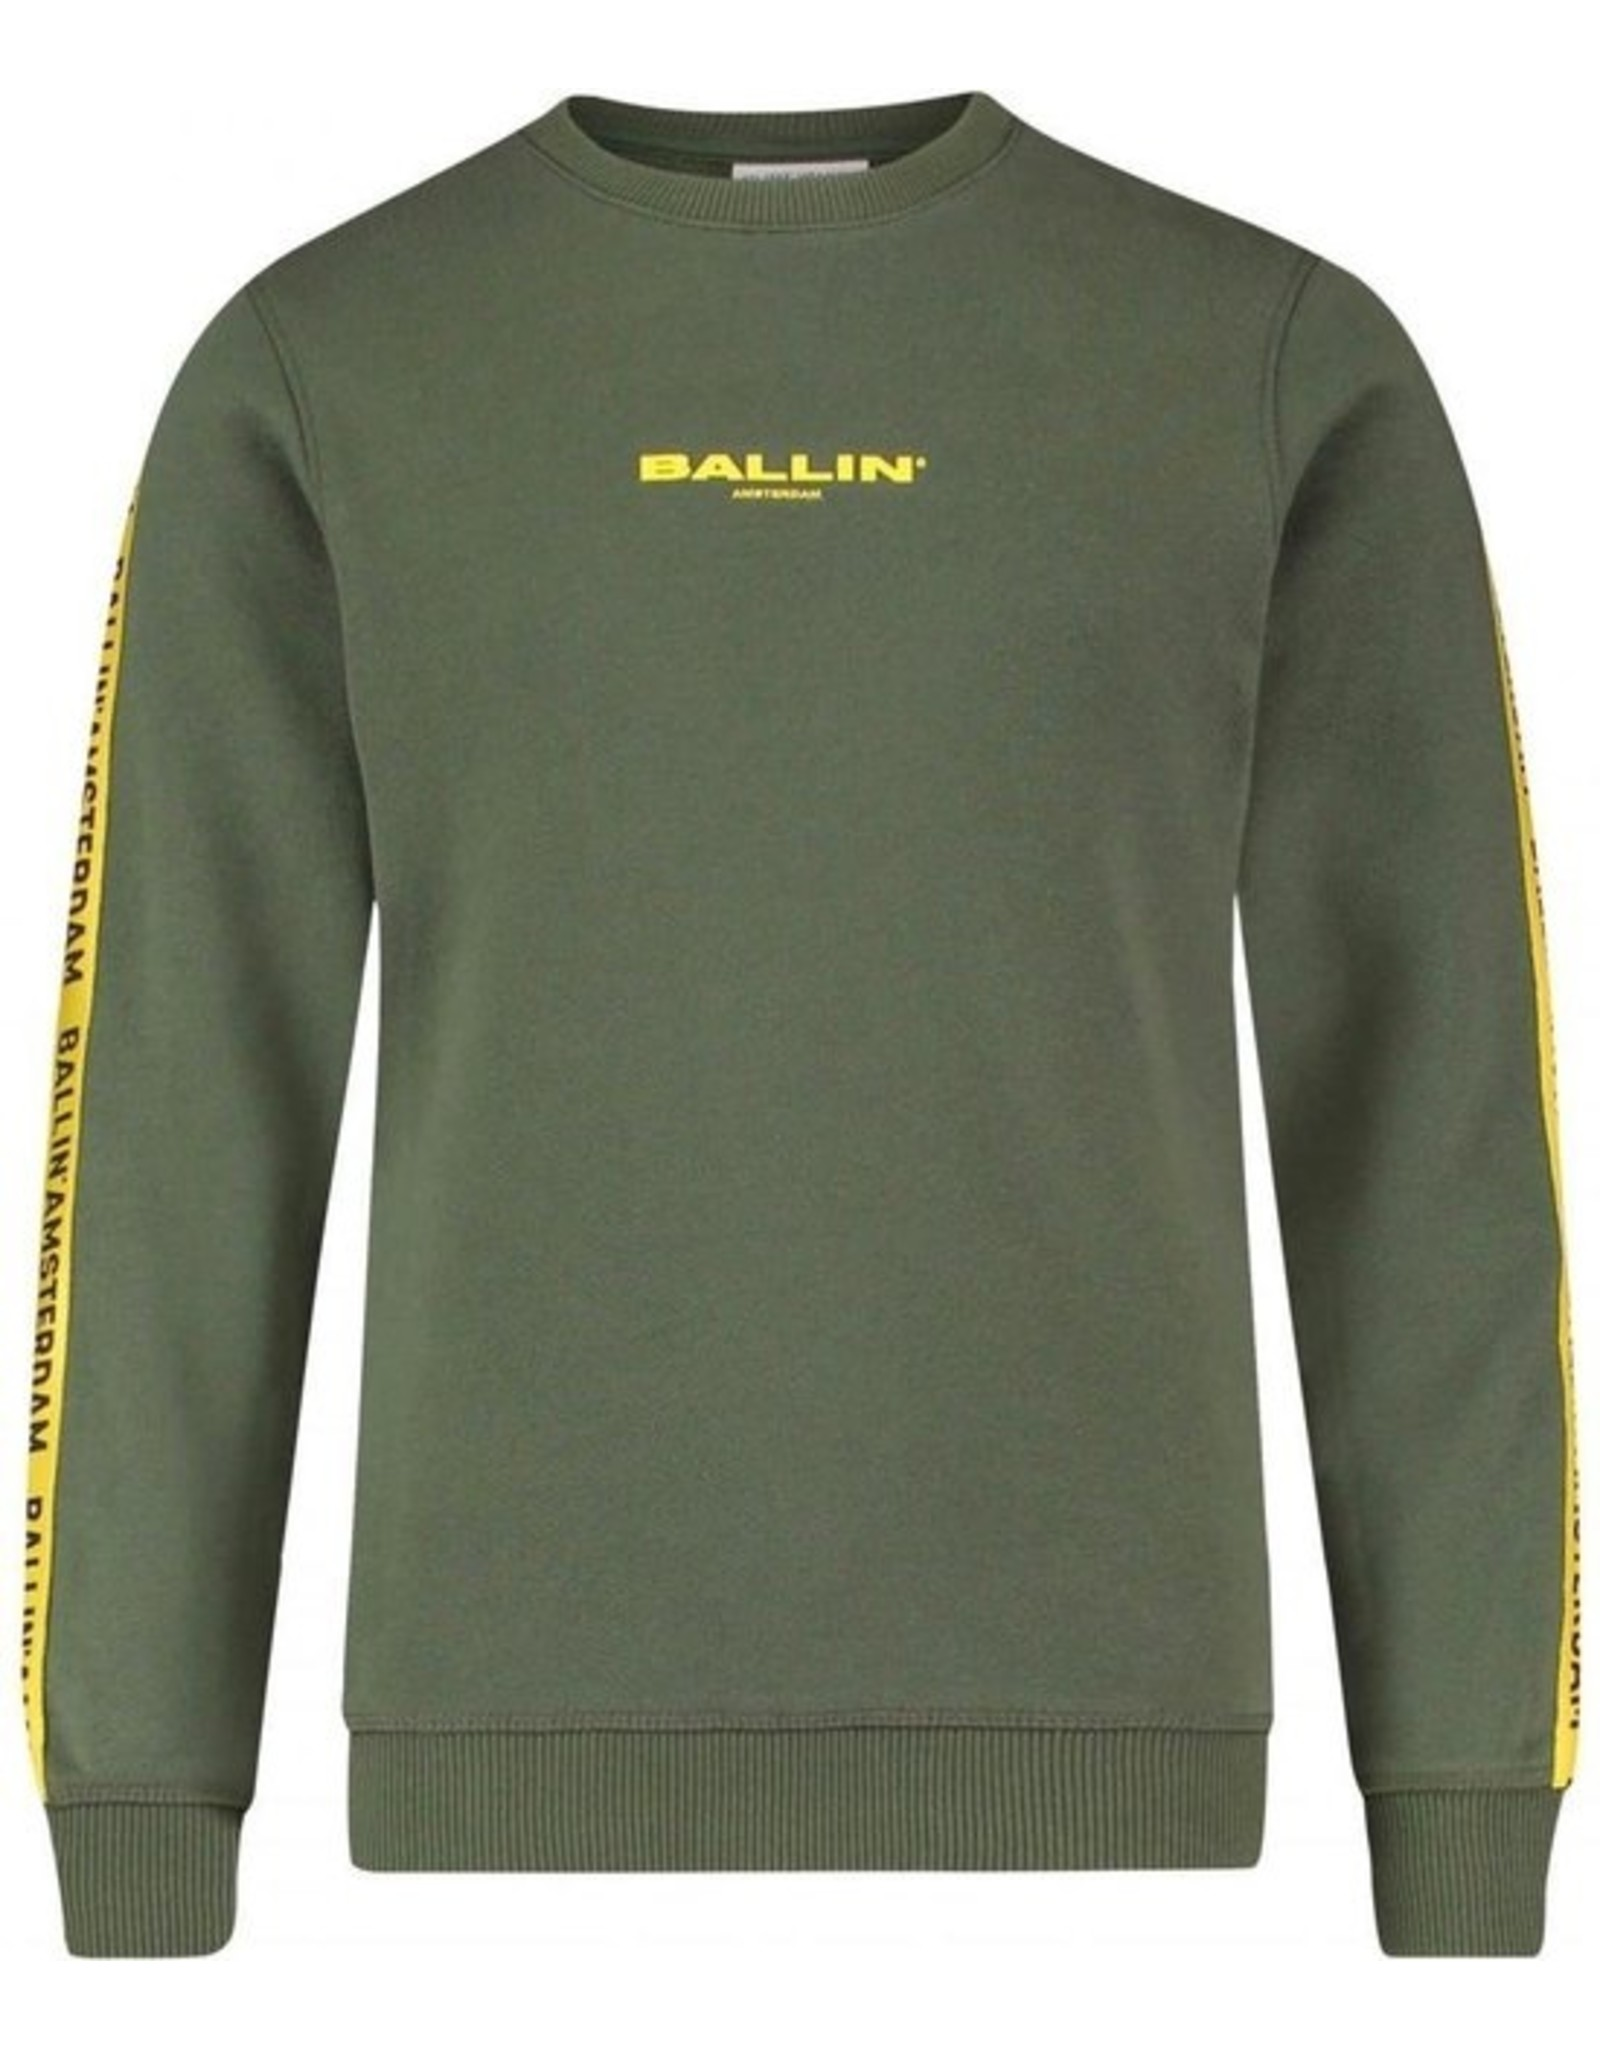 Ballin Amsterdam Sweater Army Camo